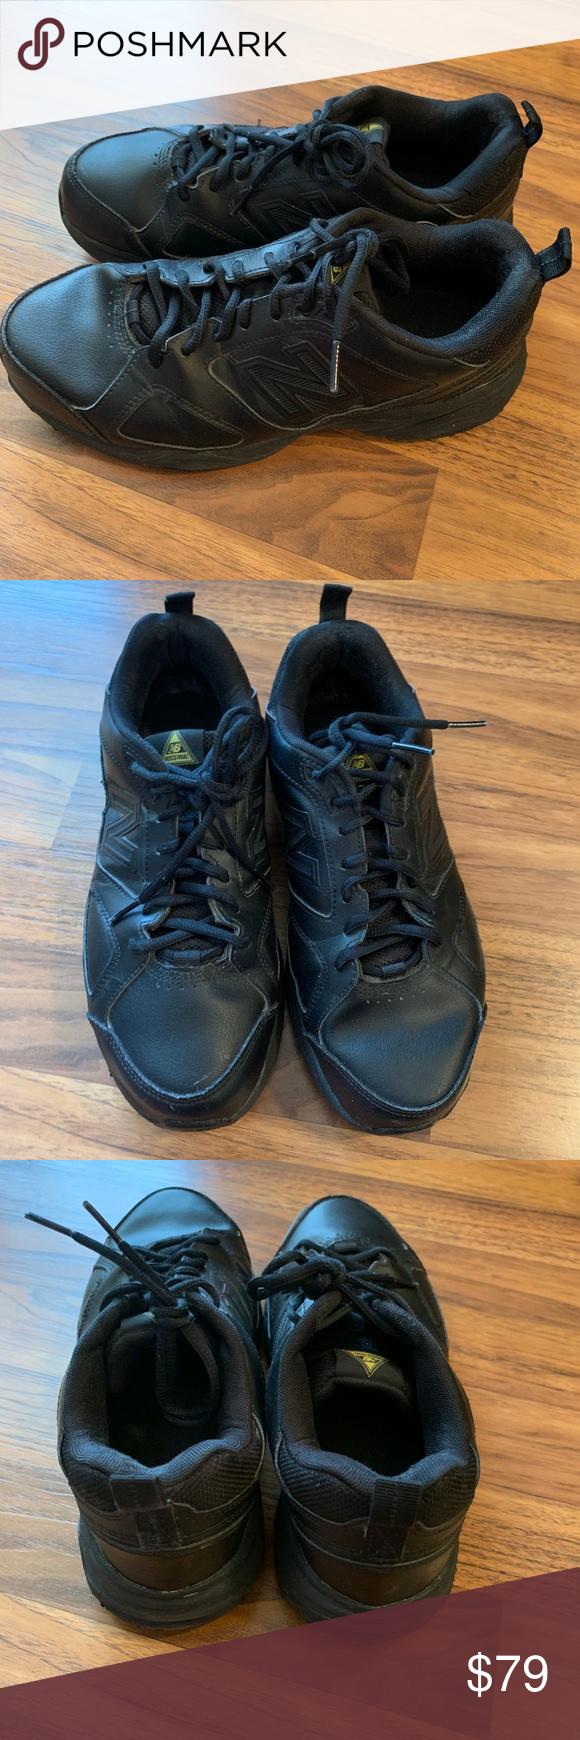 7bcab91d702a1 New Balance Men's MID626K2 Casual Comfort Training New Balance Men's  MID626K2 Casual Comfort Training Shoe, Black, 7 6E US open item customer  return New ...